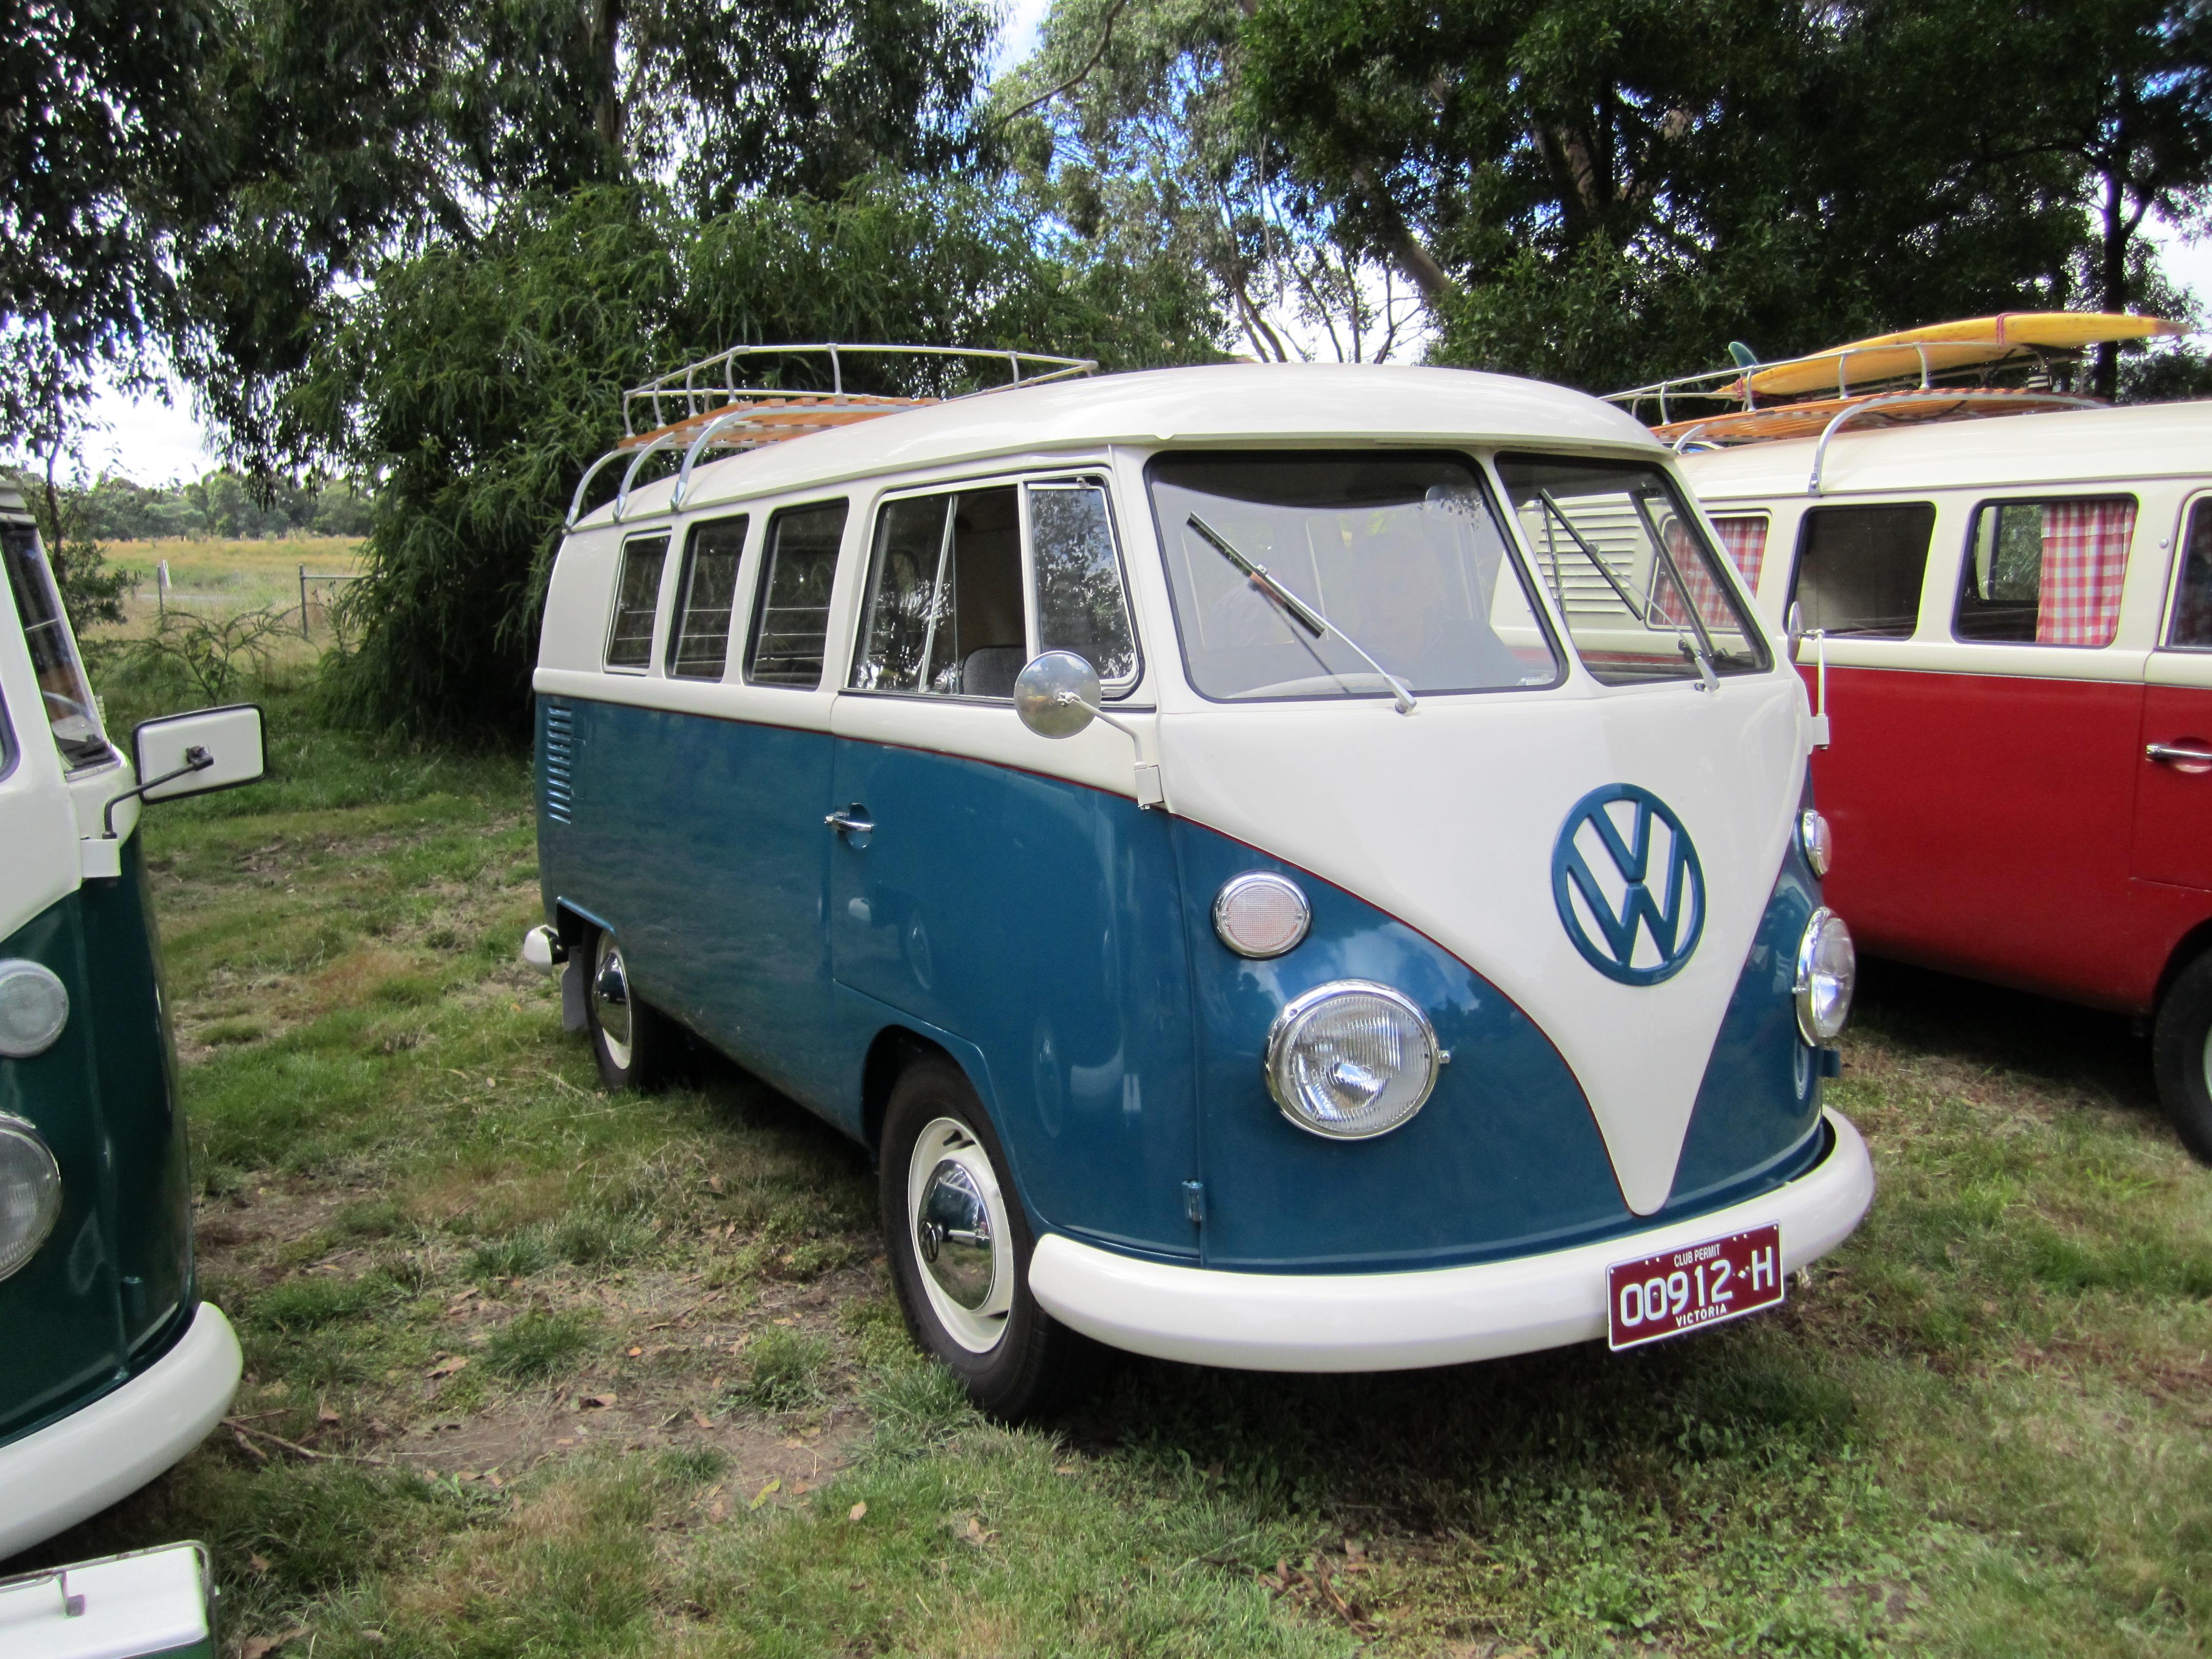 File:1953 Volkswagen Kombi T1.jpg - Wikimedia Commons